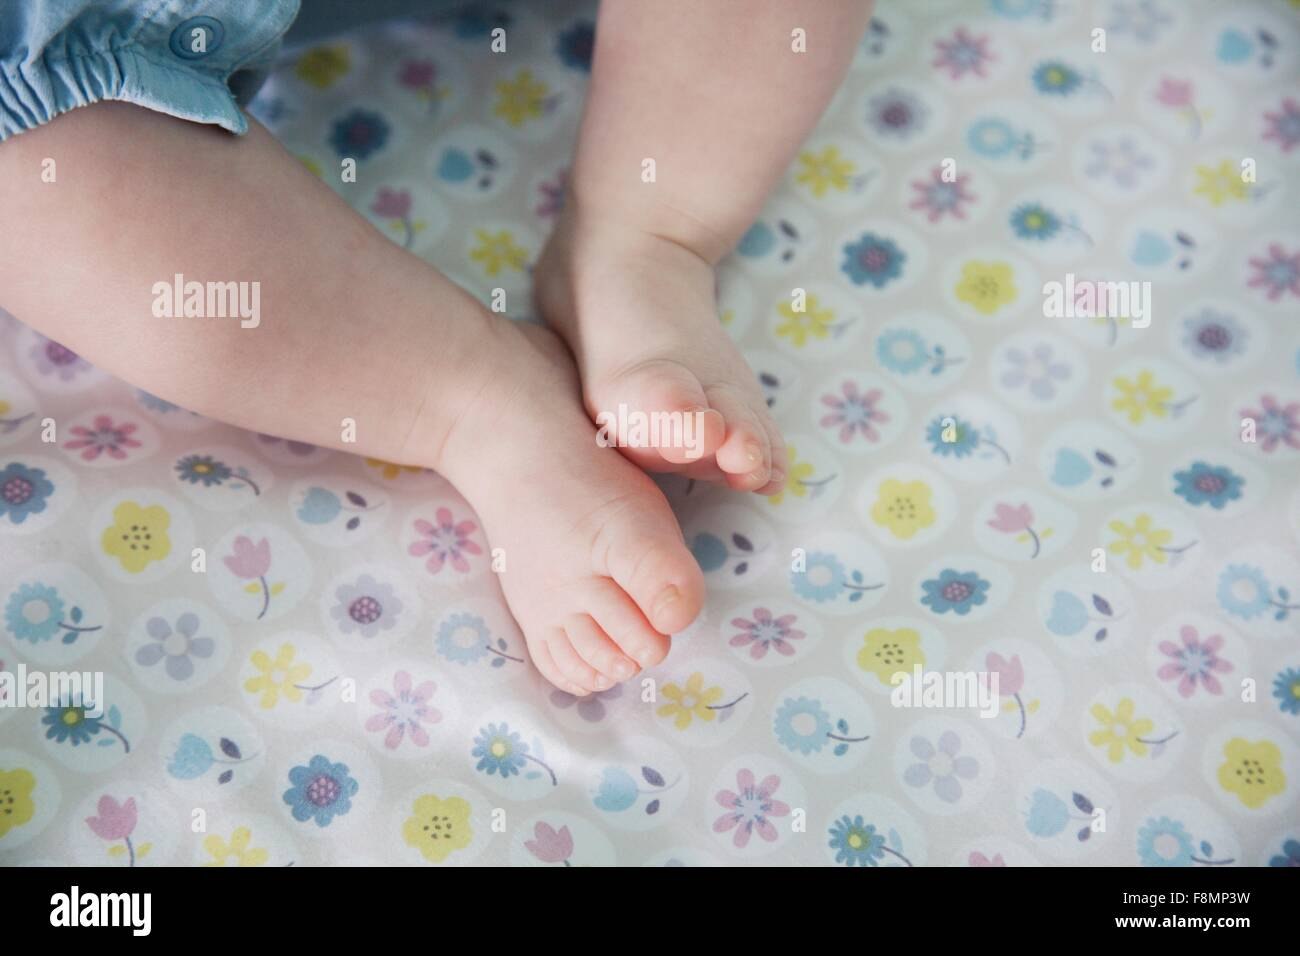 Baby girl lying down, focus on feet - Stock Image